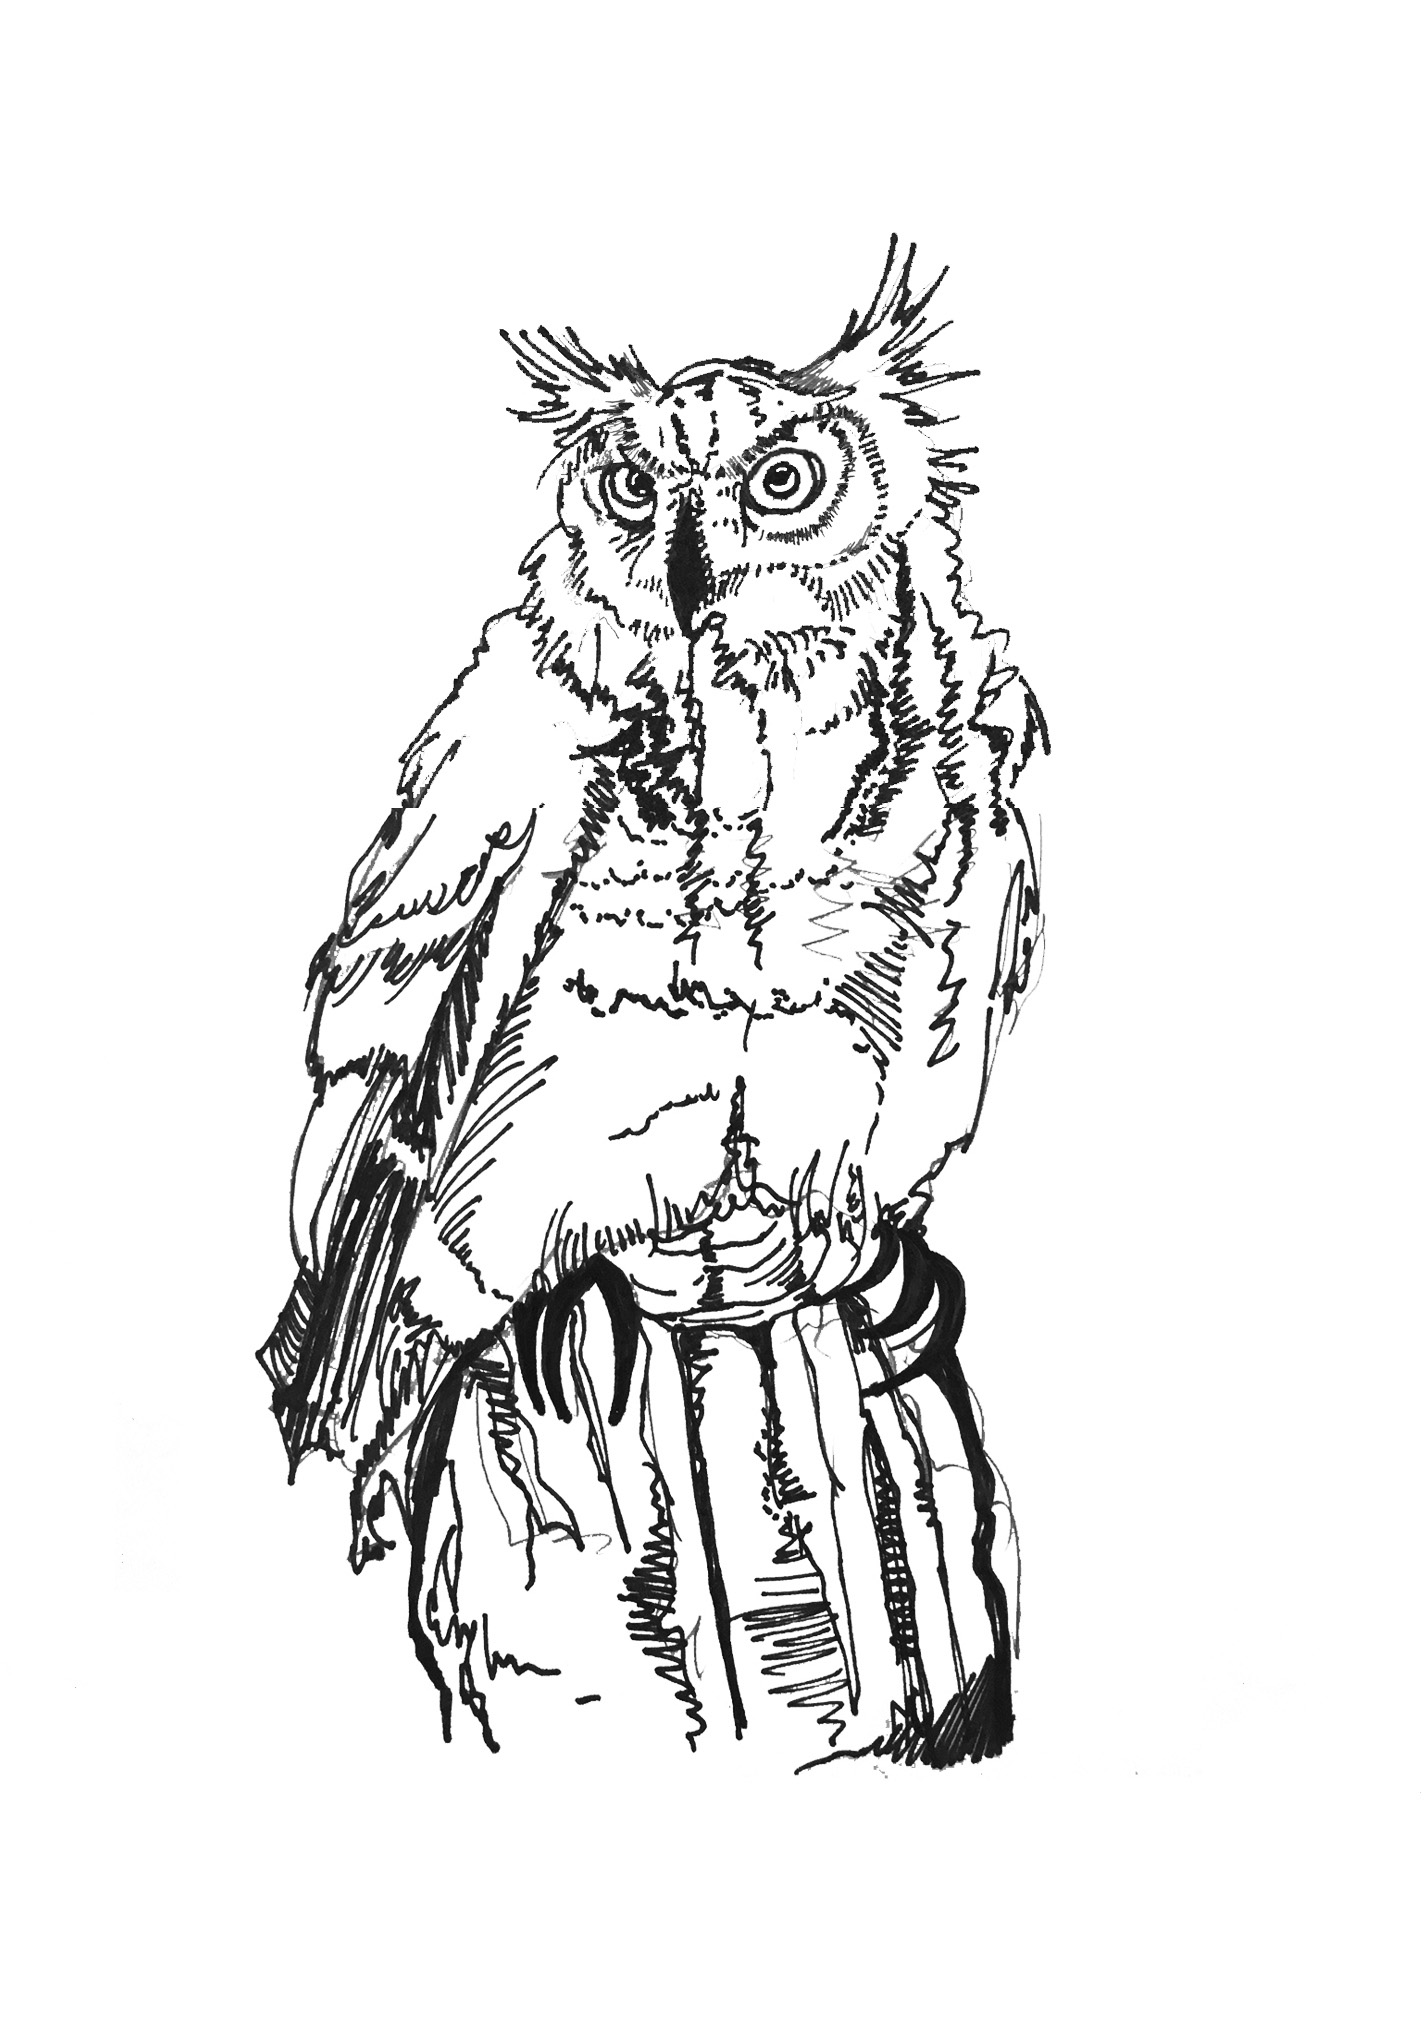 Owl Illustration by Katharine Balardo